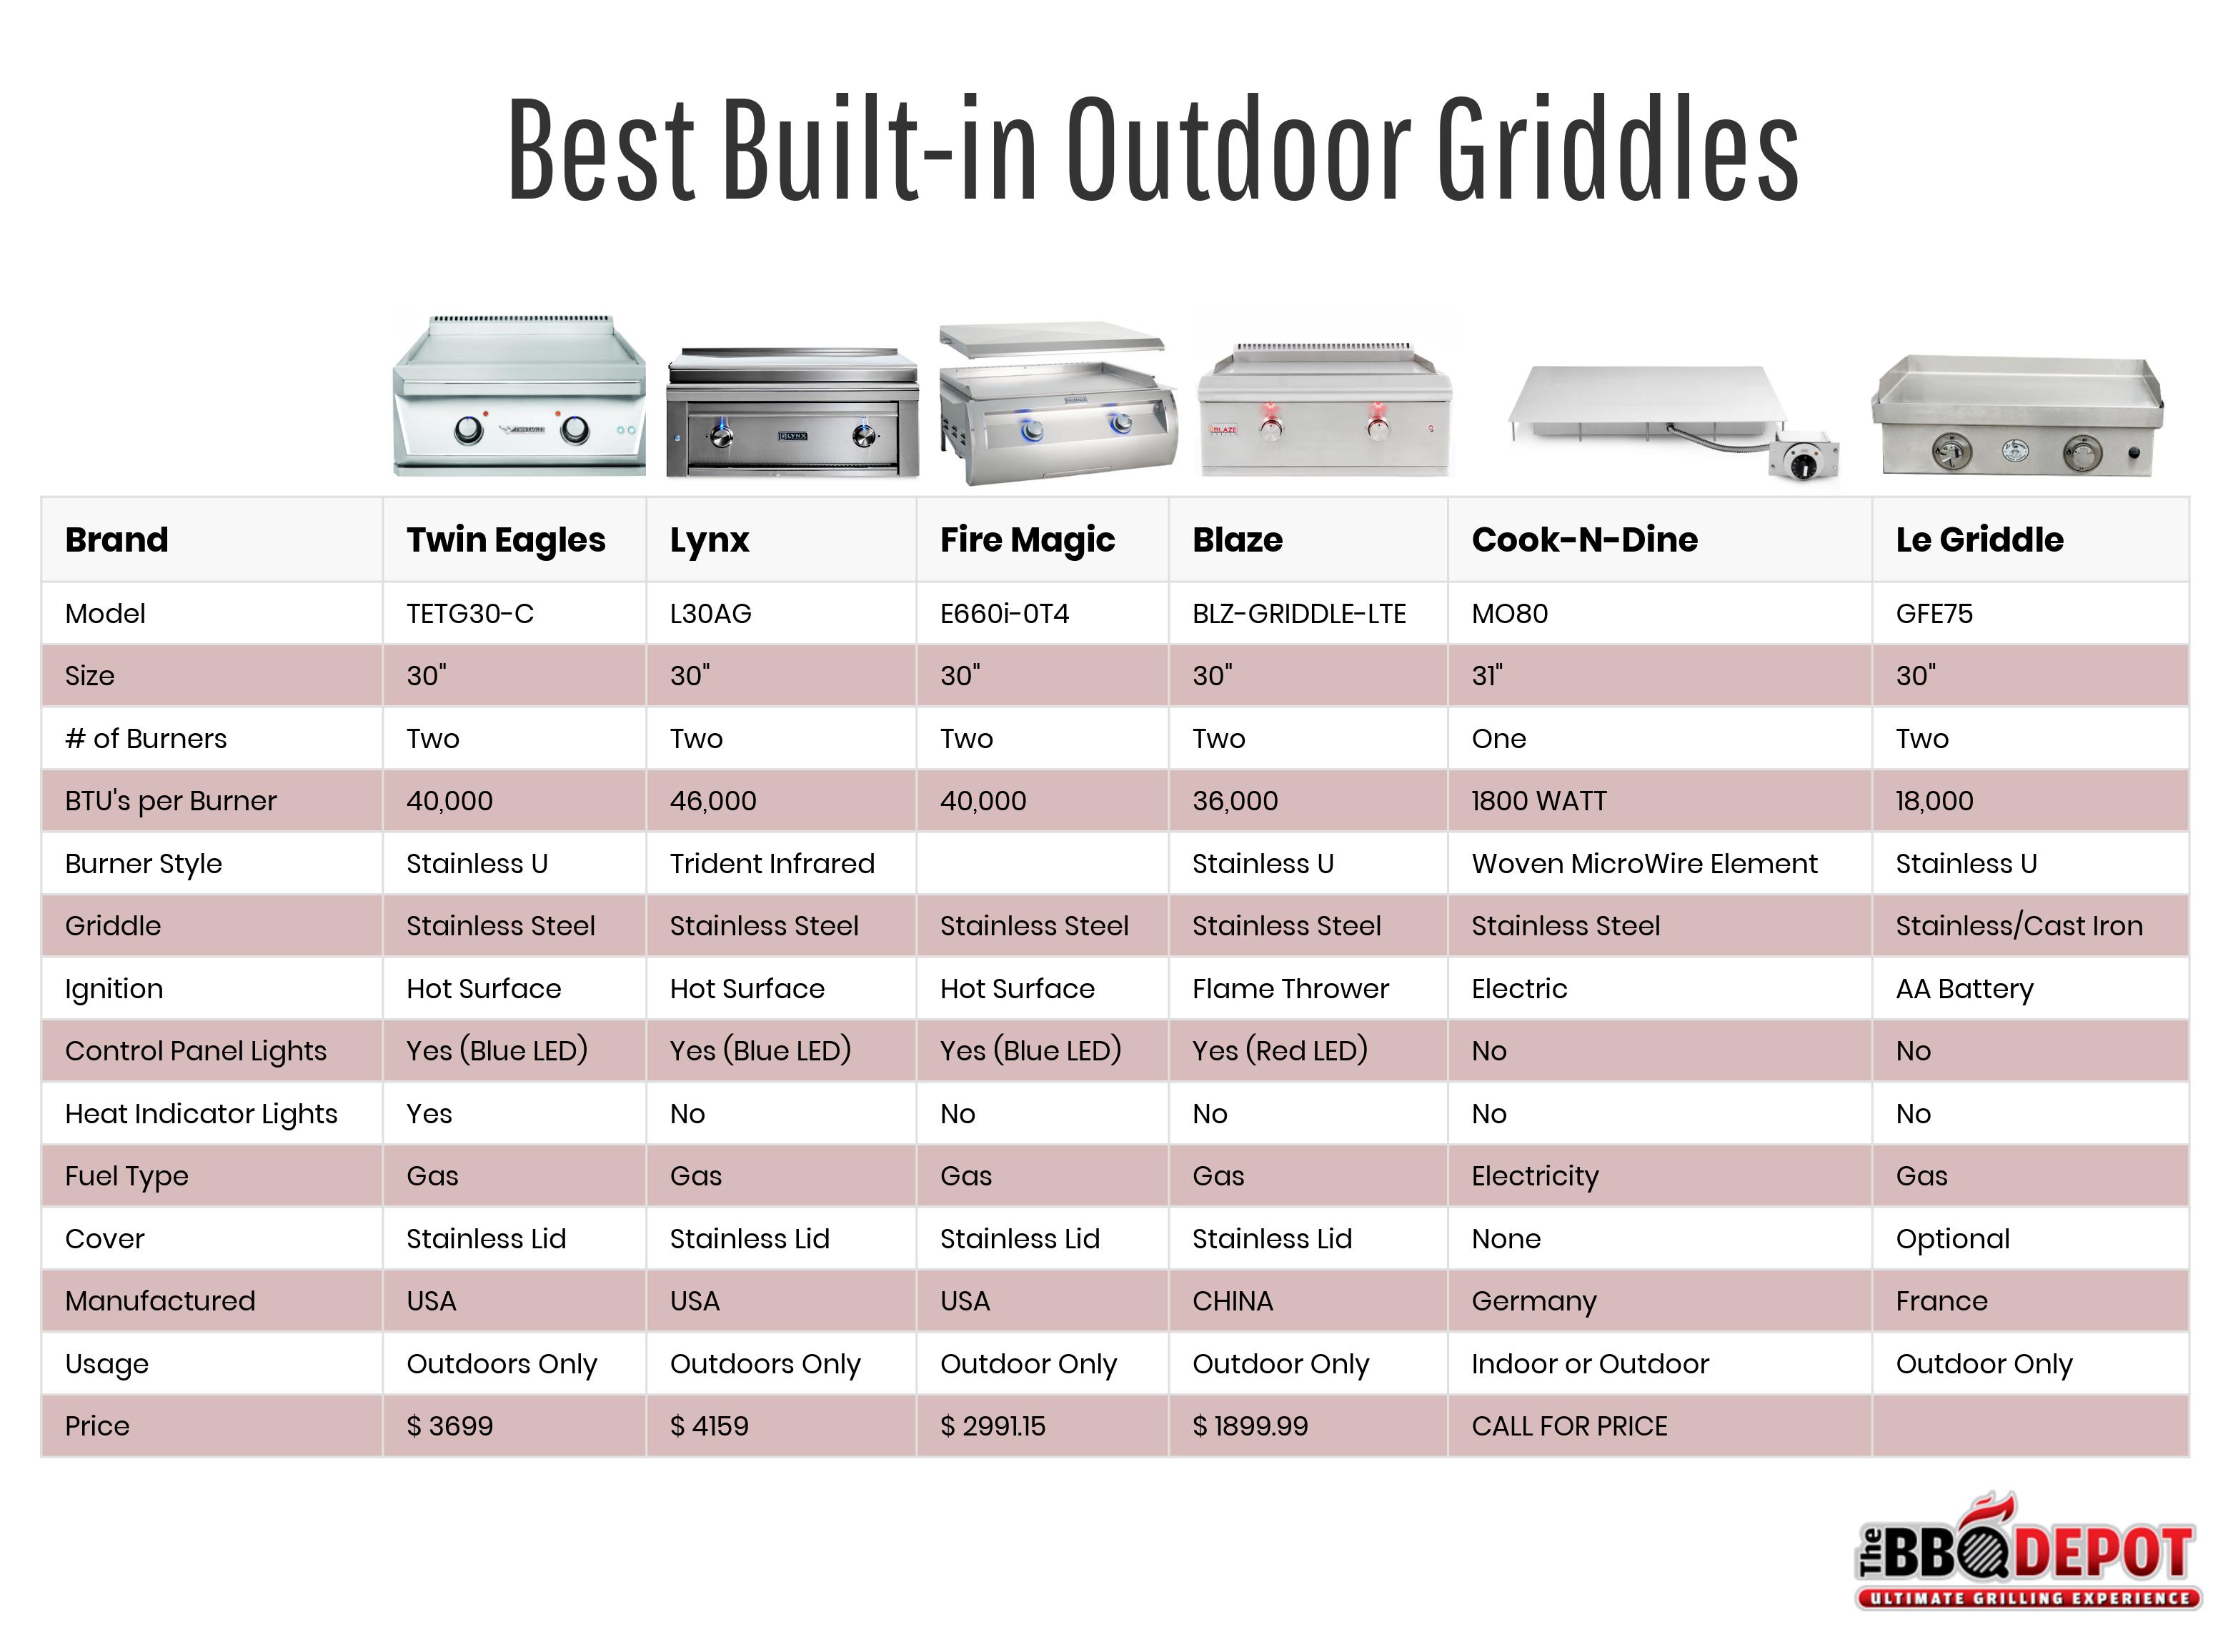 Best Built-in Outdoor Griddles